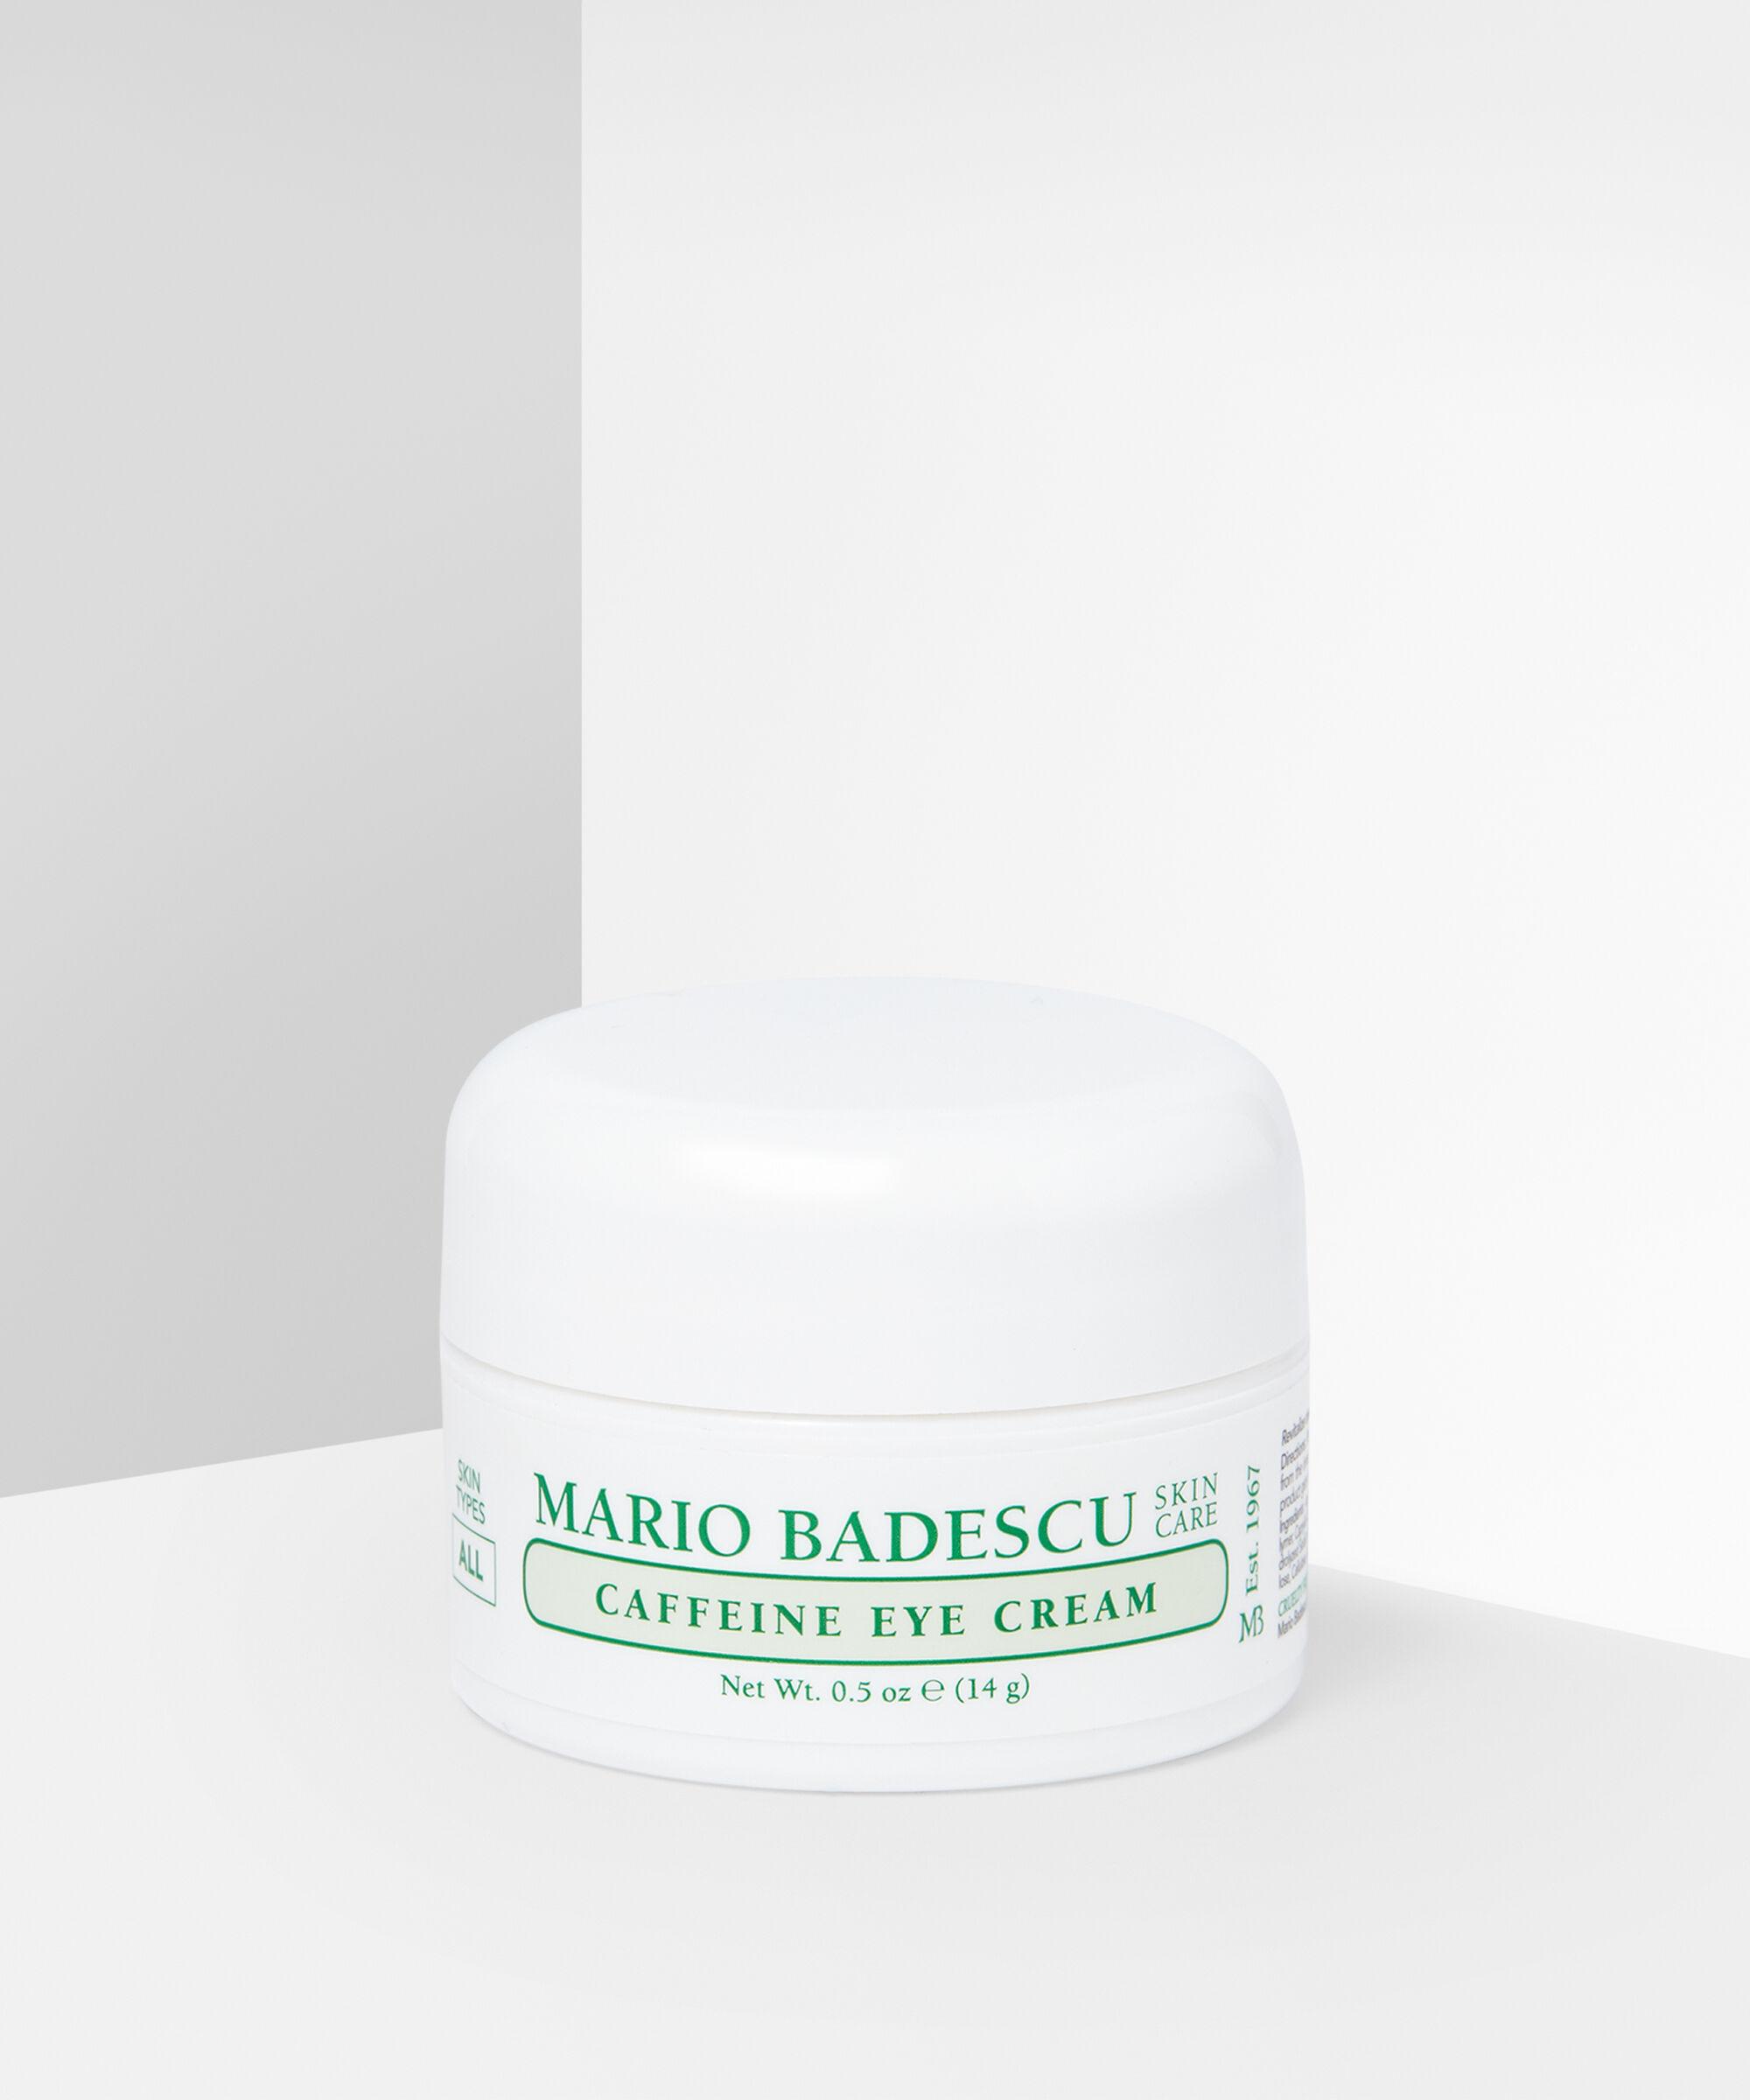 Mario Badescu - Caffeine Eye Cream